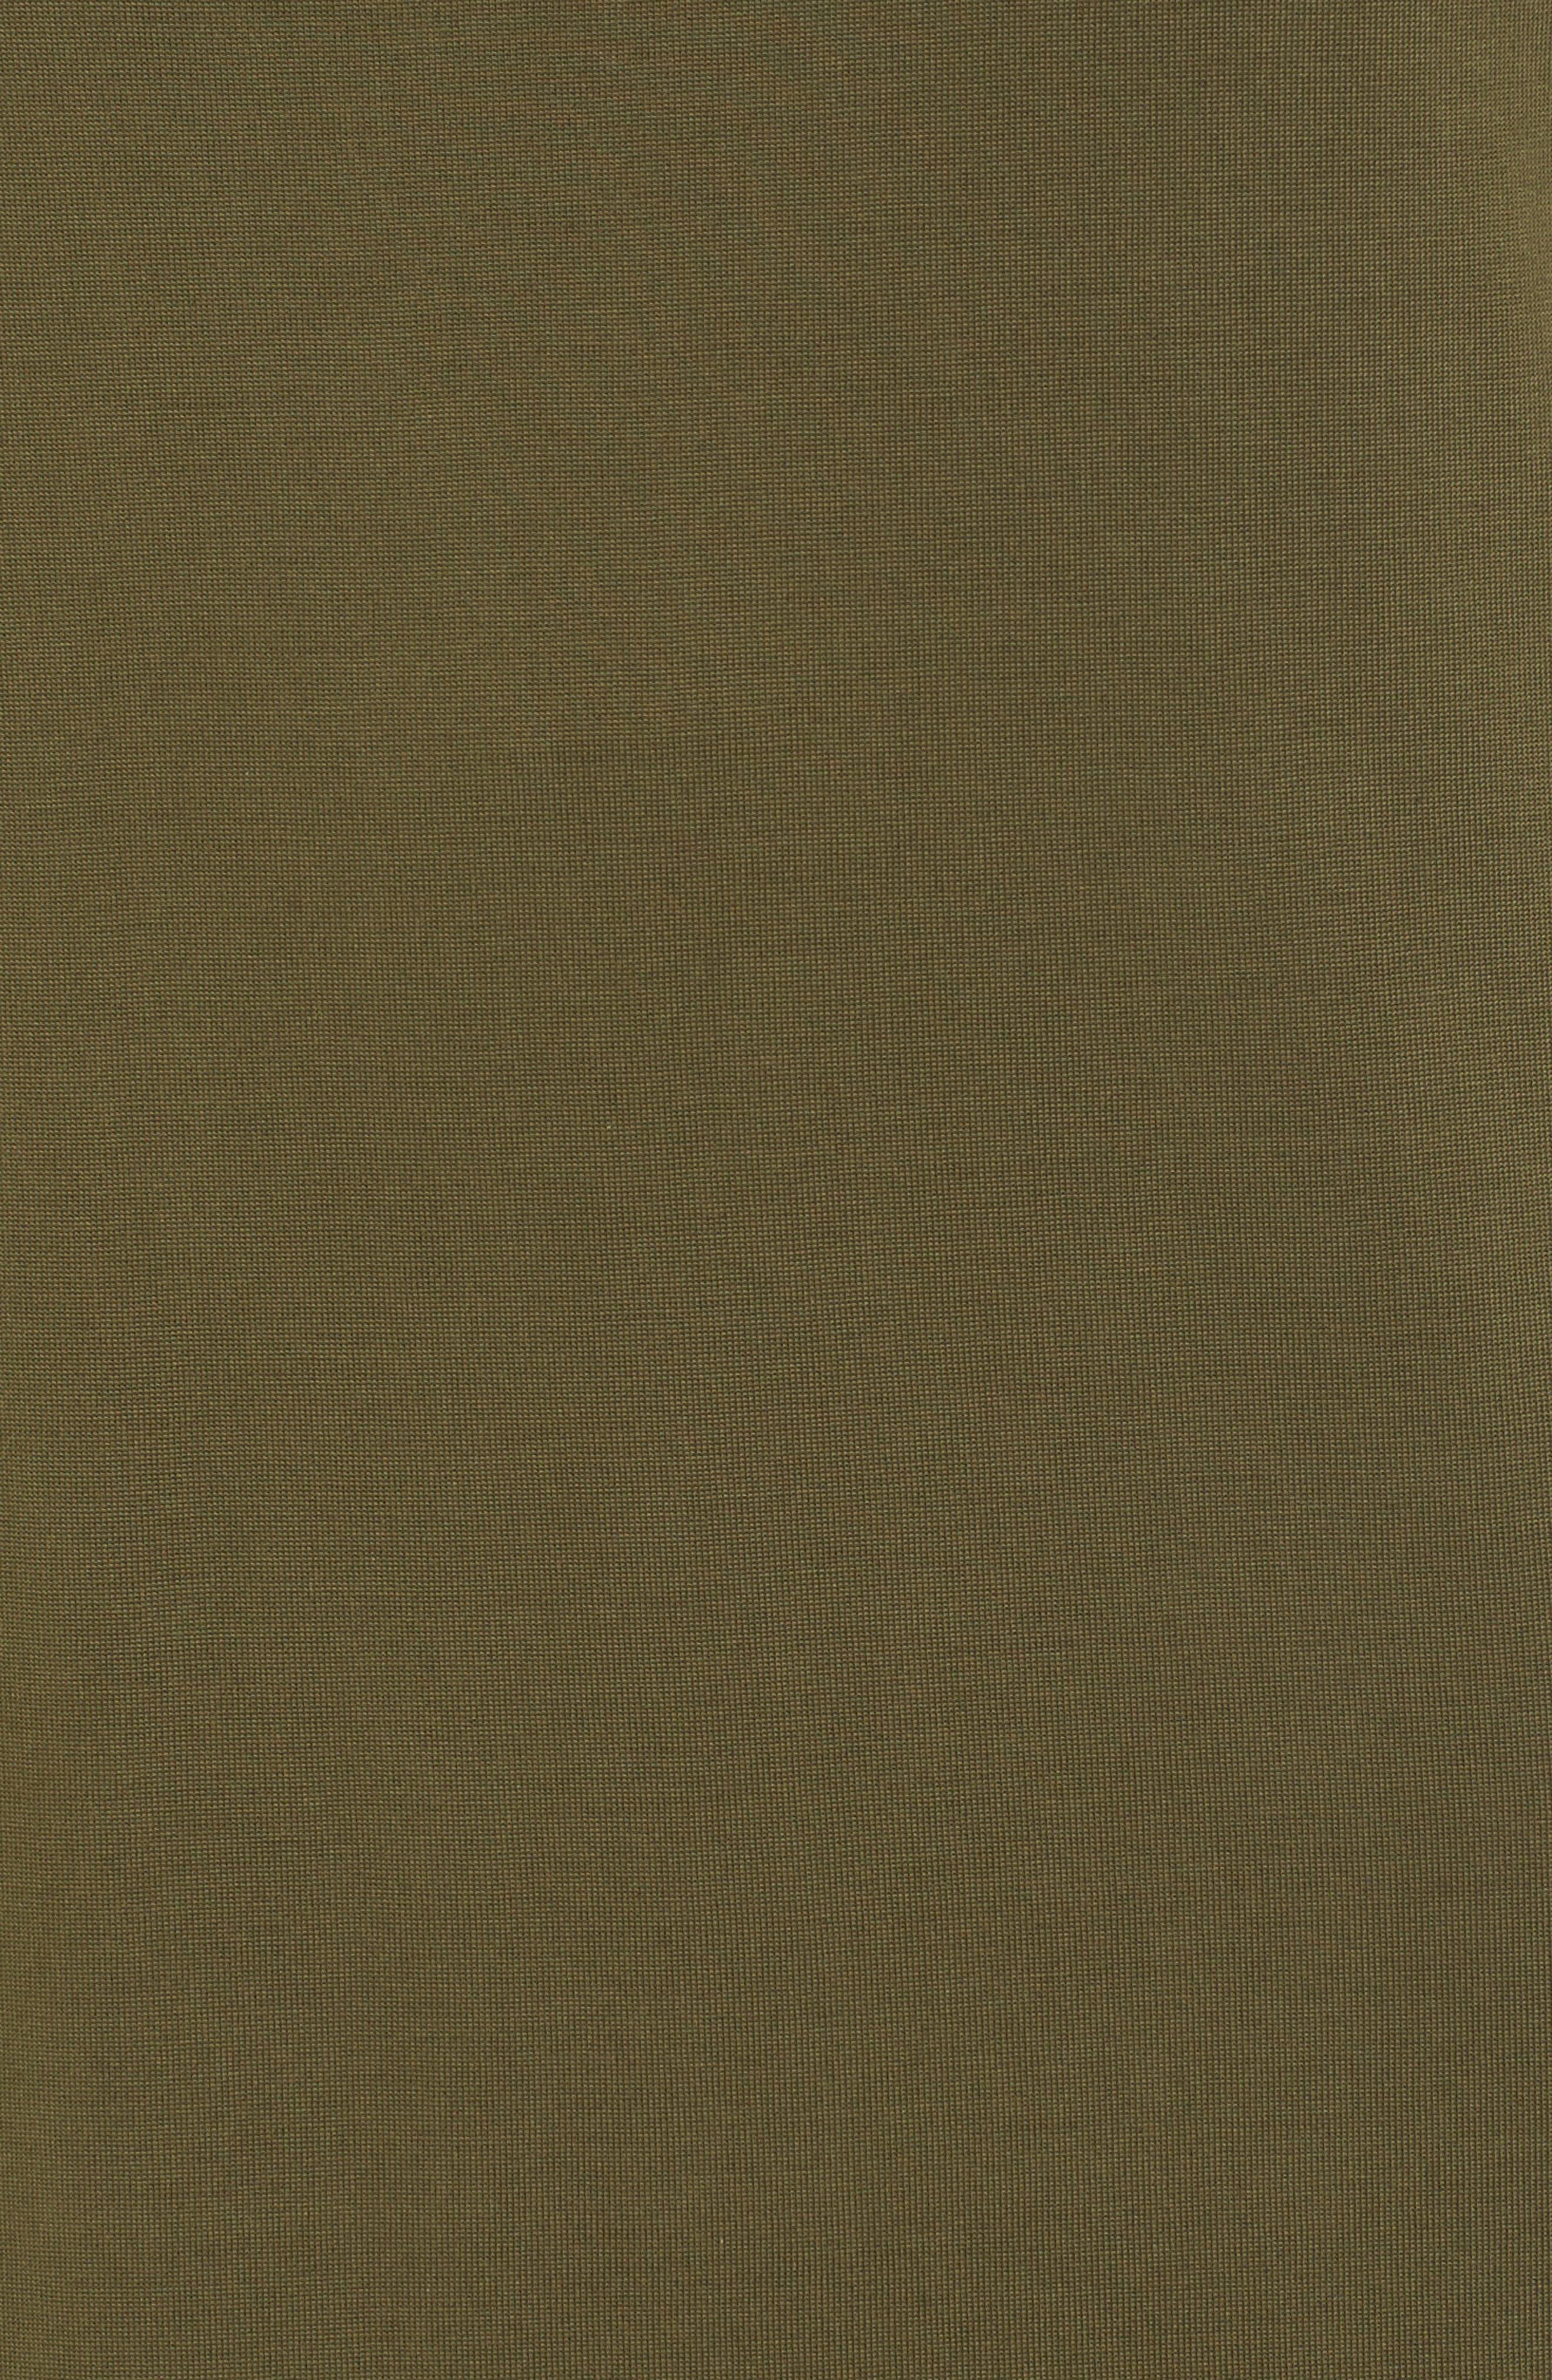 High Slit Maxi Dress,                             Alternate thumbnail 5, color,                             Olive Sarma